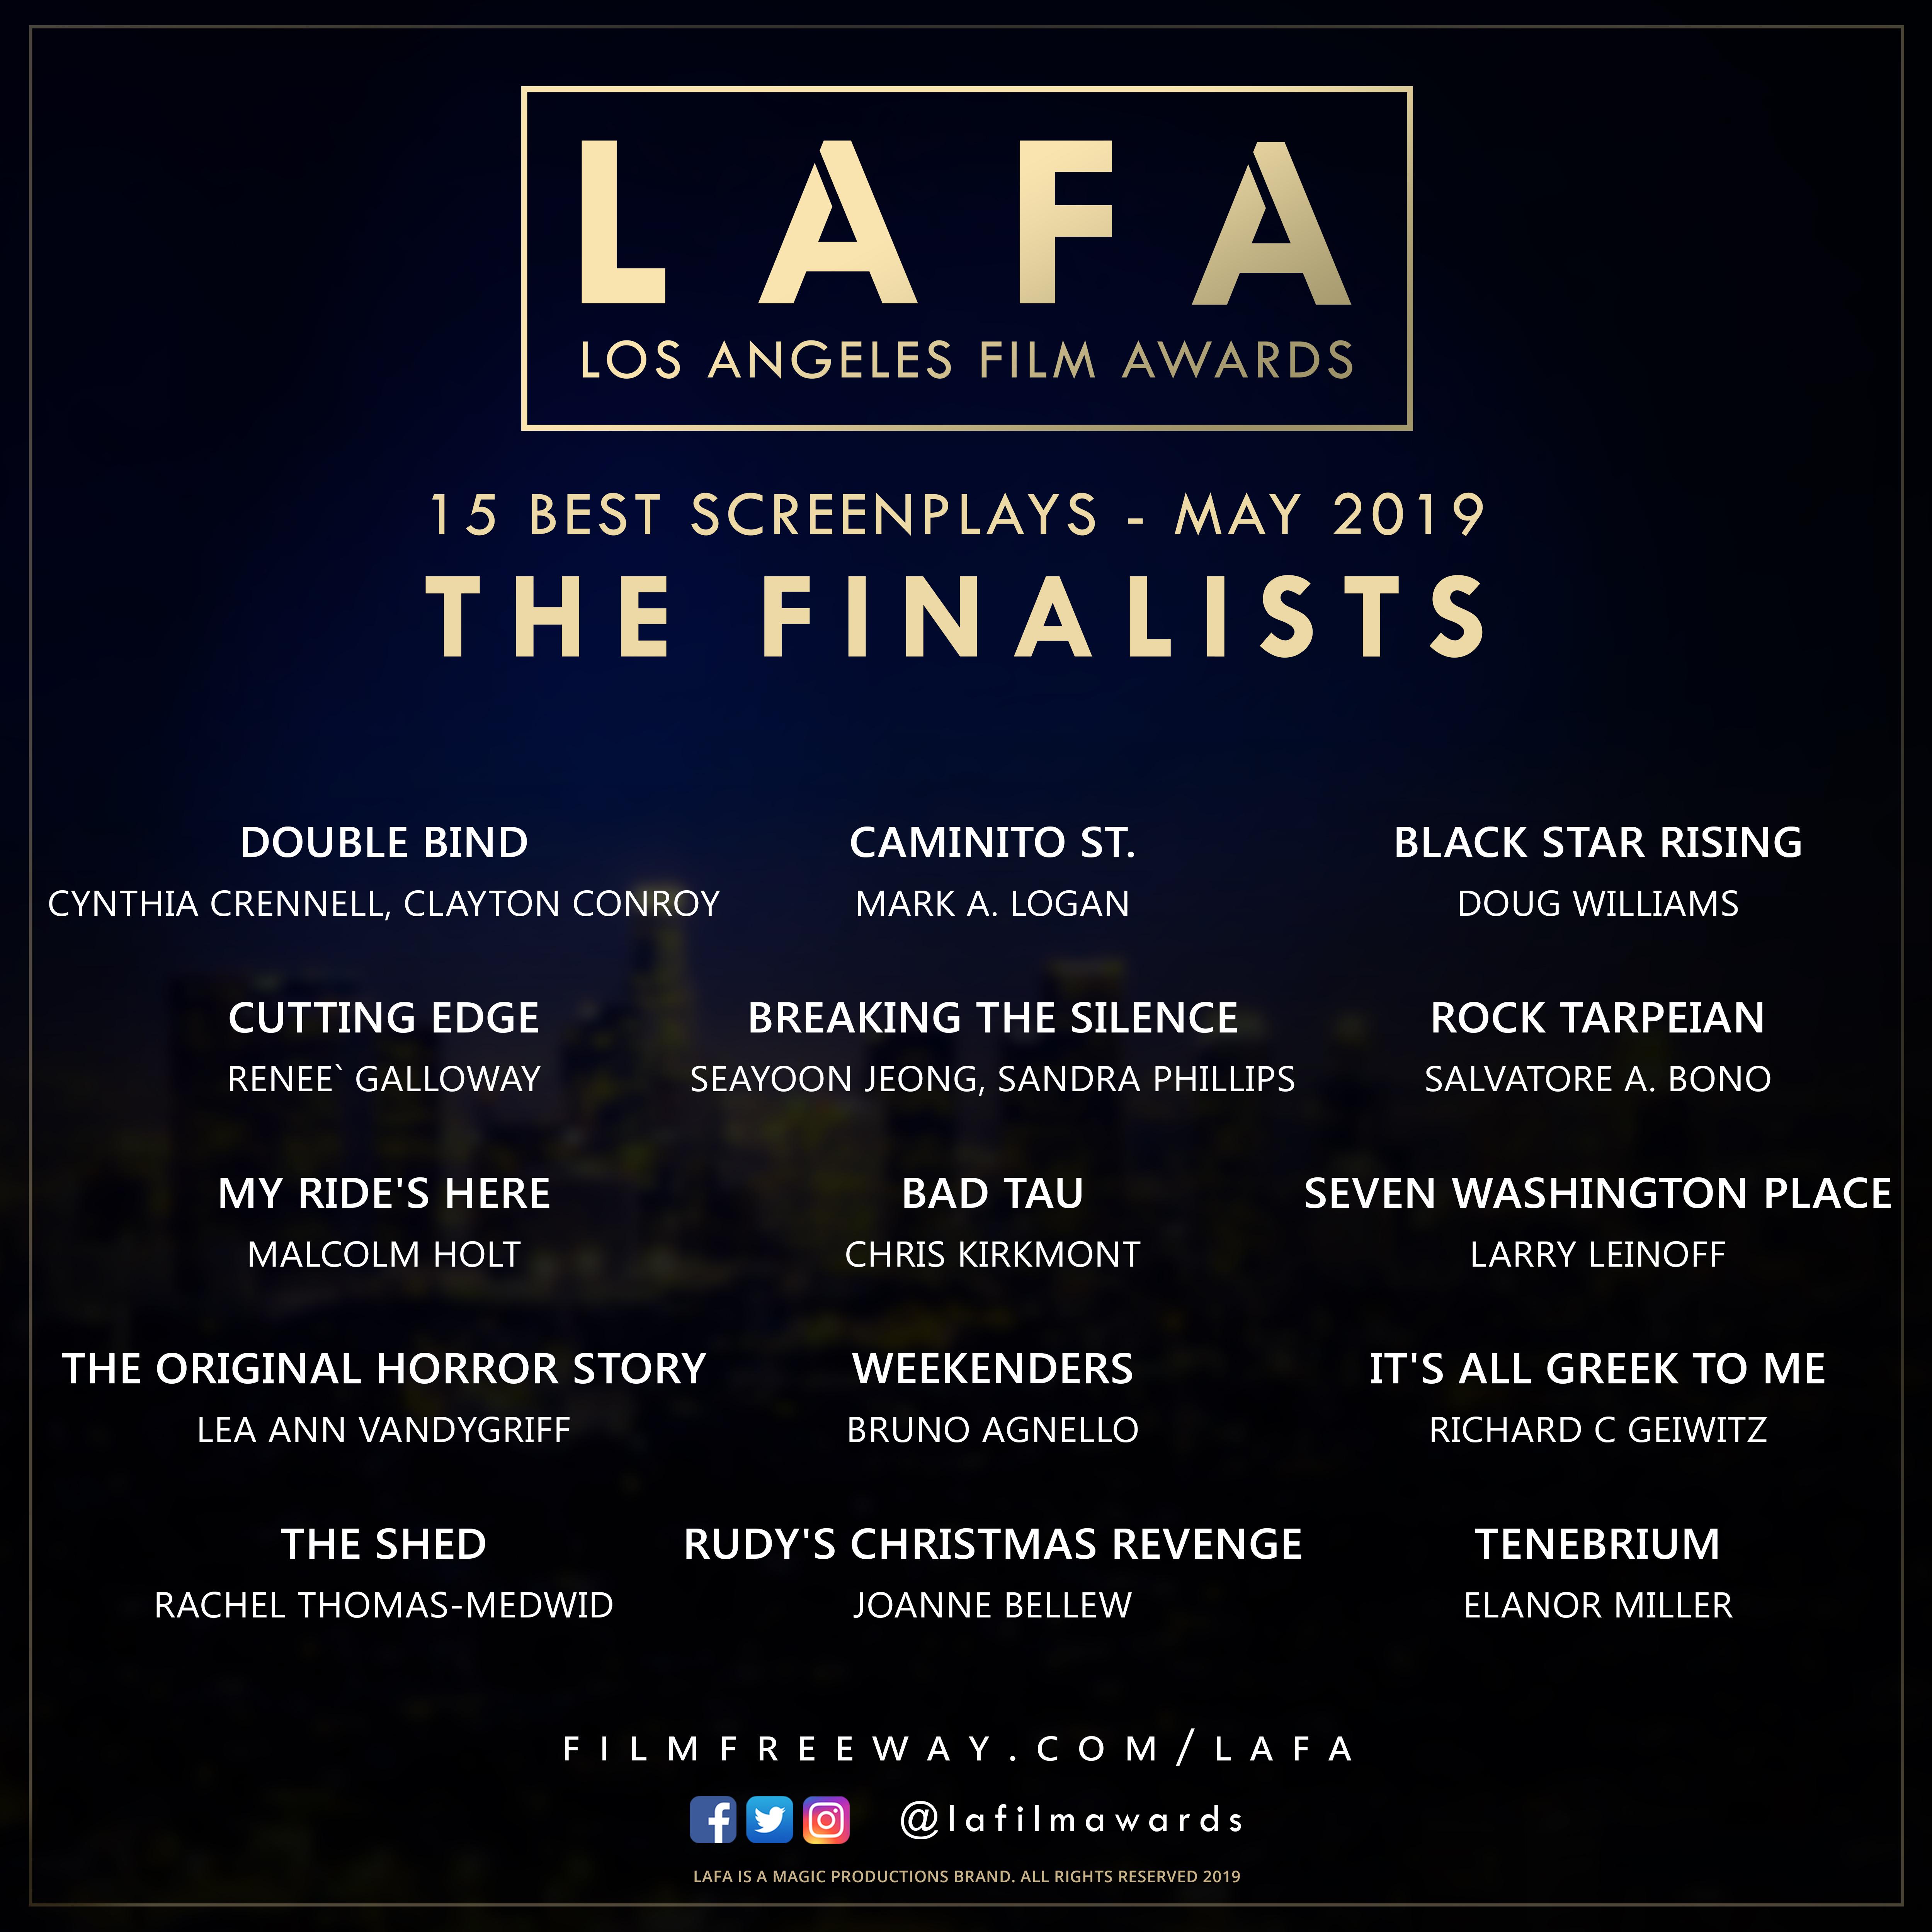 LAFA SCREENPLAY FINALISTS 2019 05.